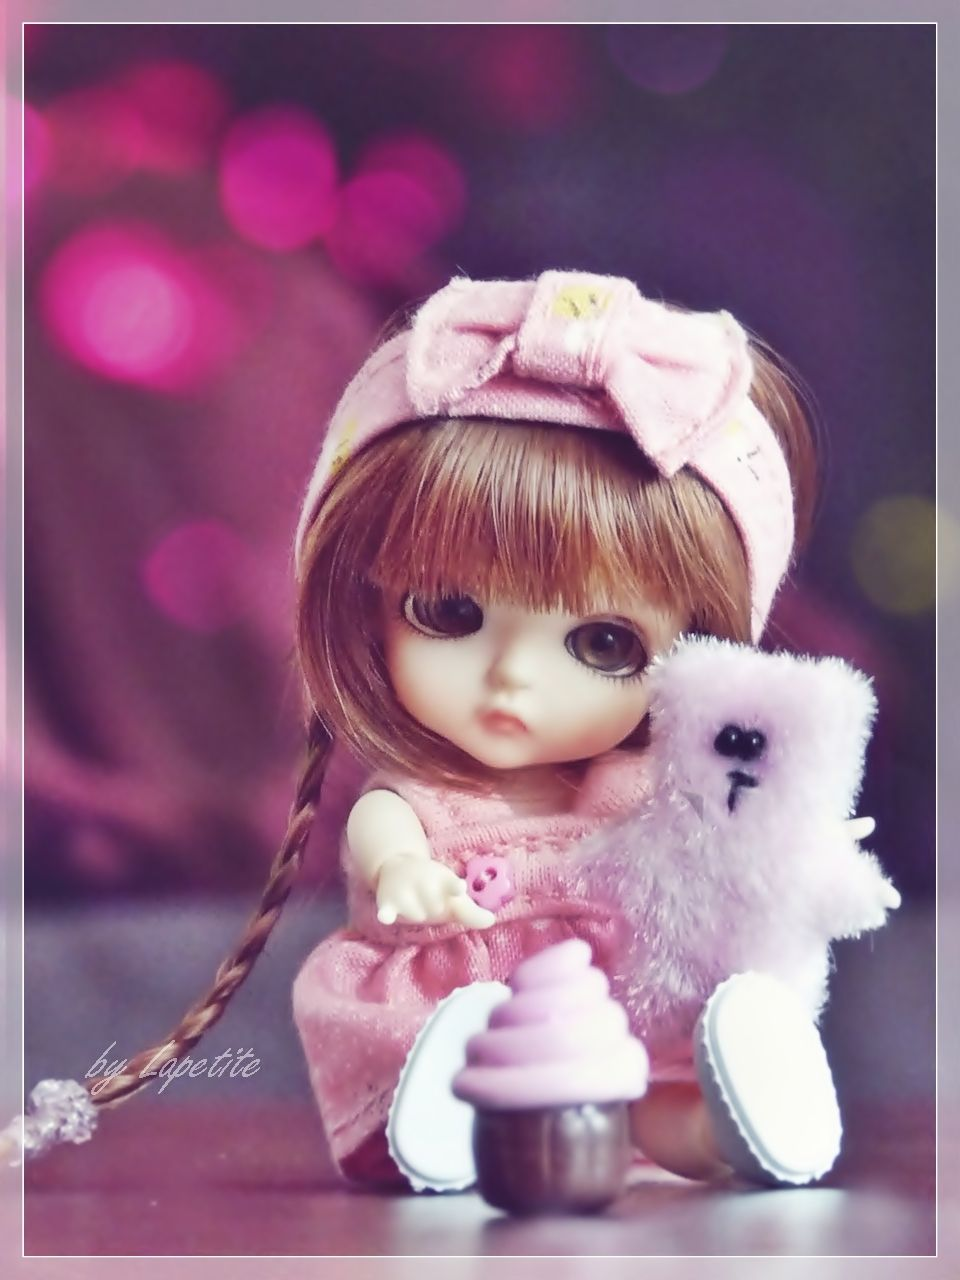 Daniela Costa S Favorites Pretty Dolls Cute Baby Dolls Bjd Dolls Girls